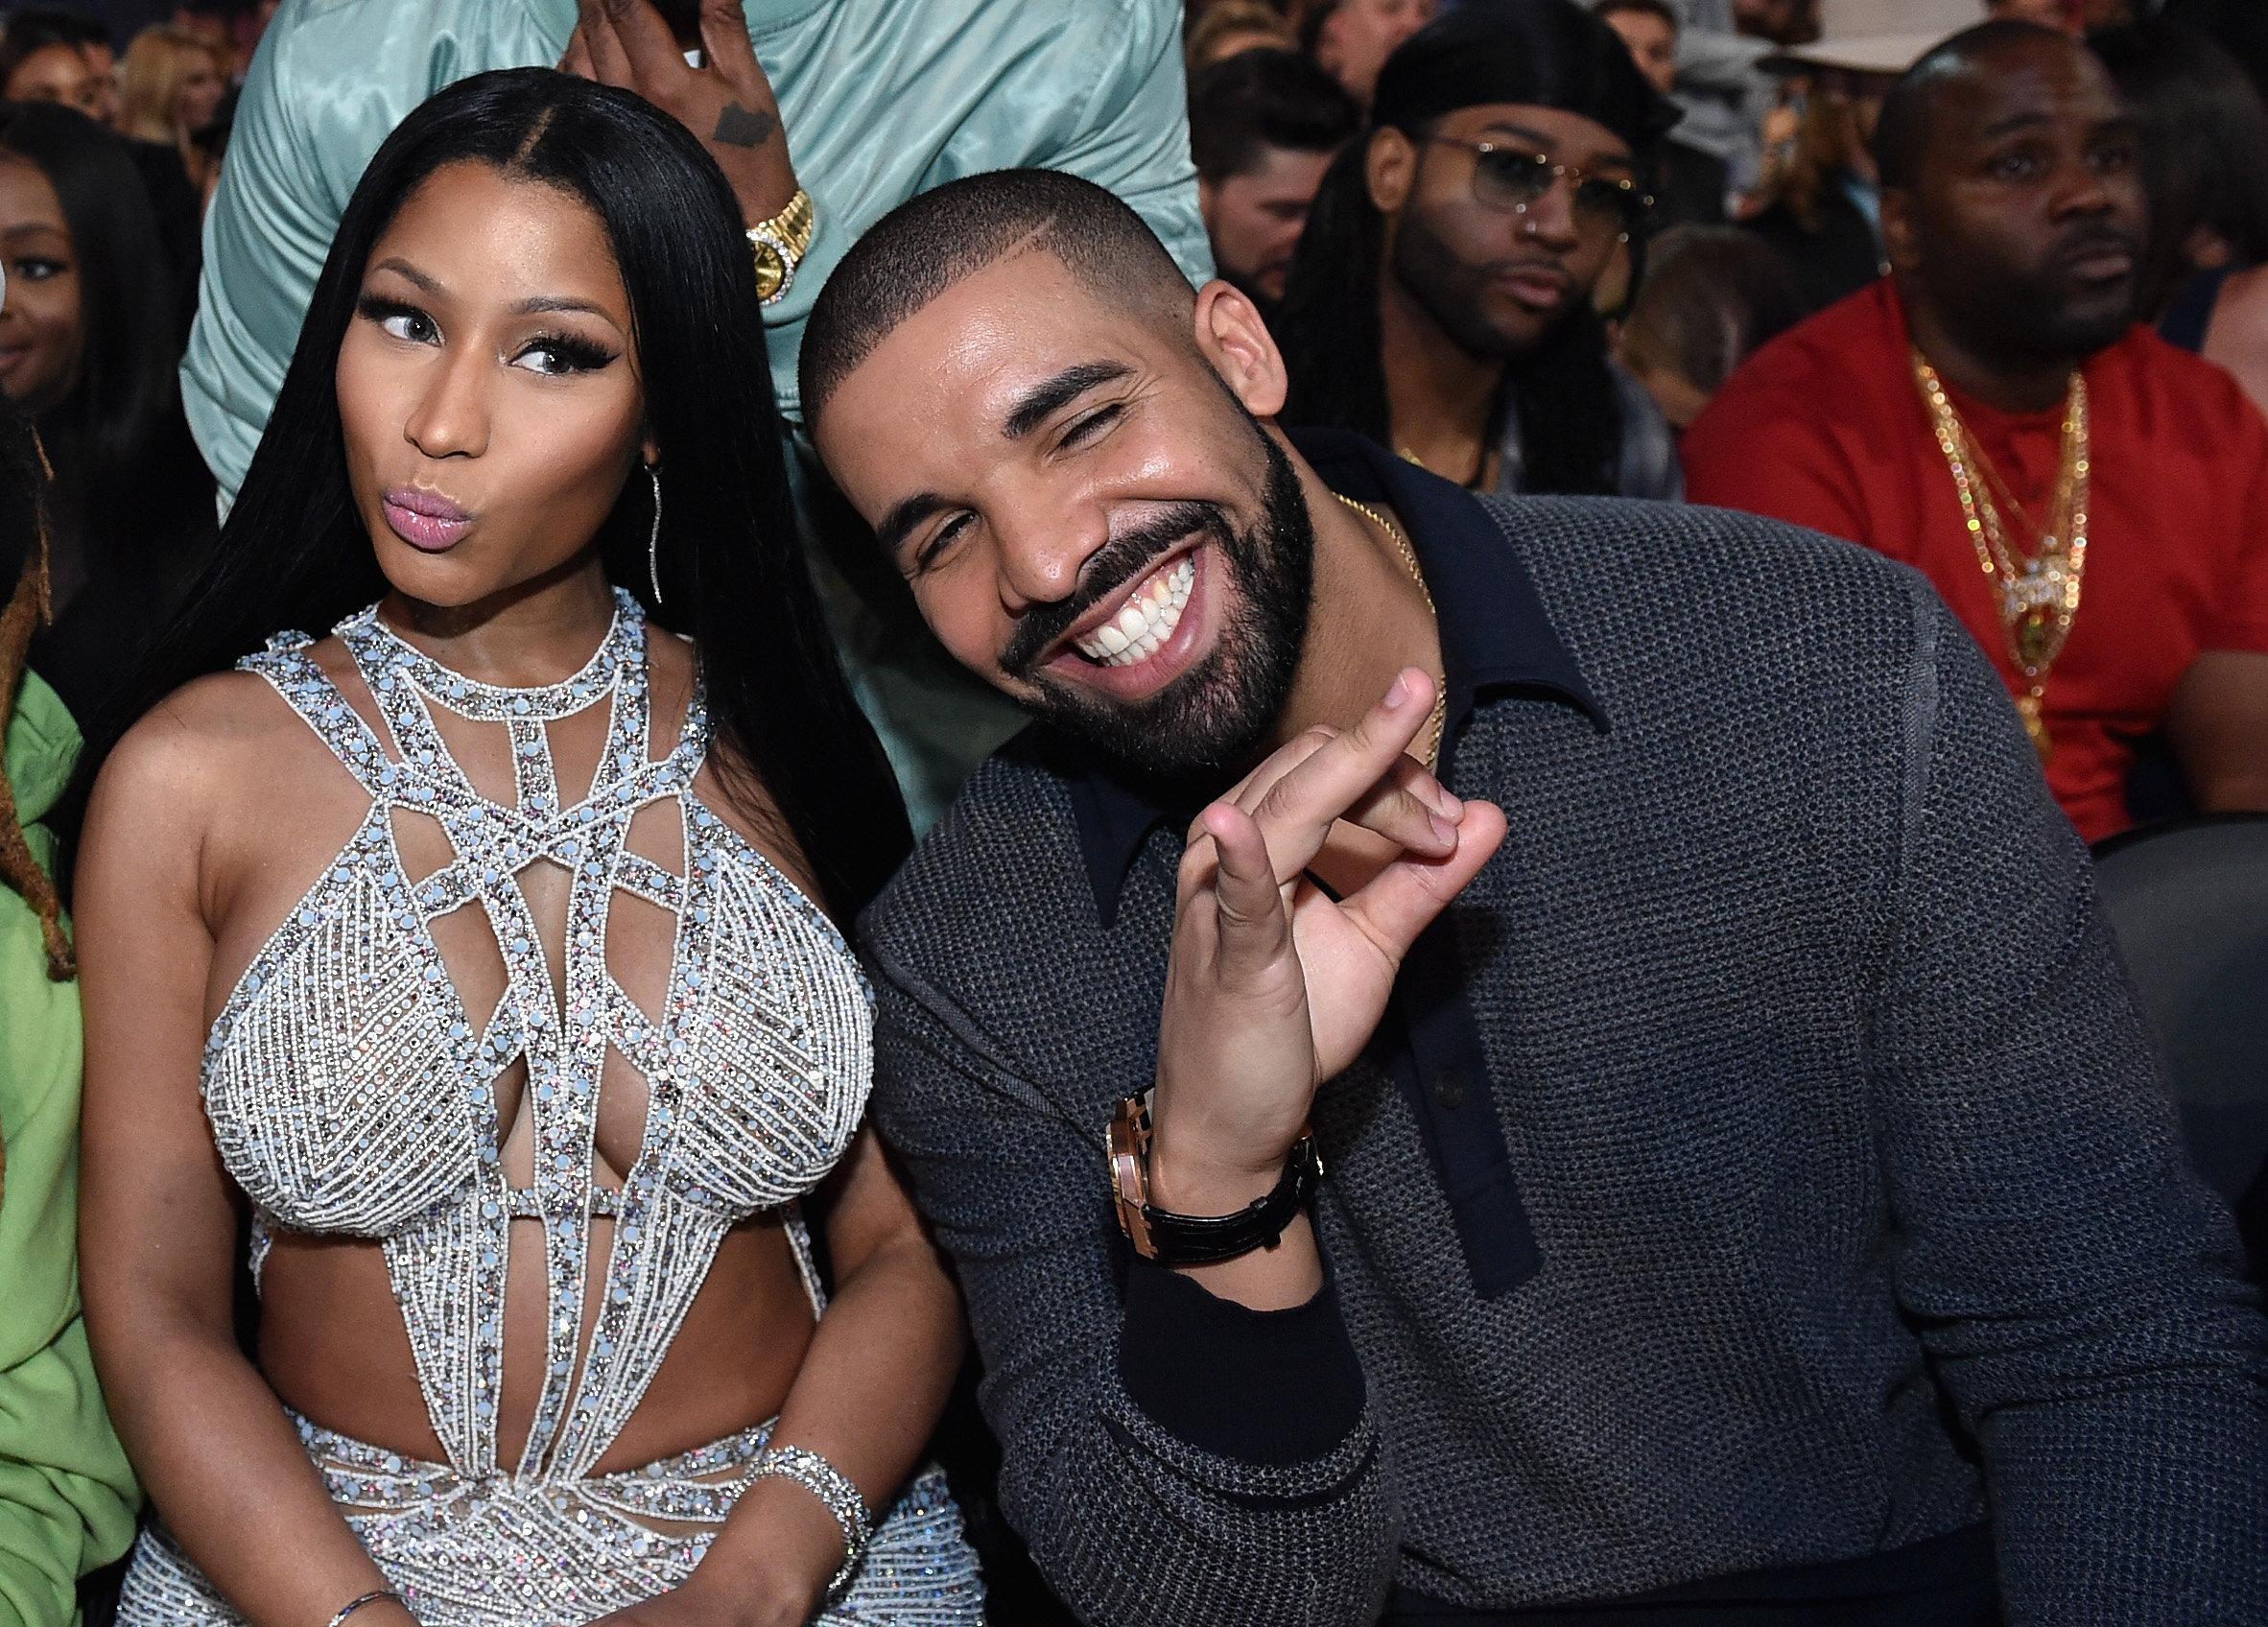 Nicki Minaj Was Not Having Drake's Praise for Vanessa Hudgens atBMAs